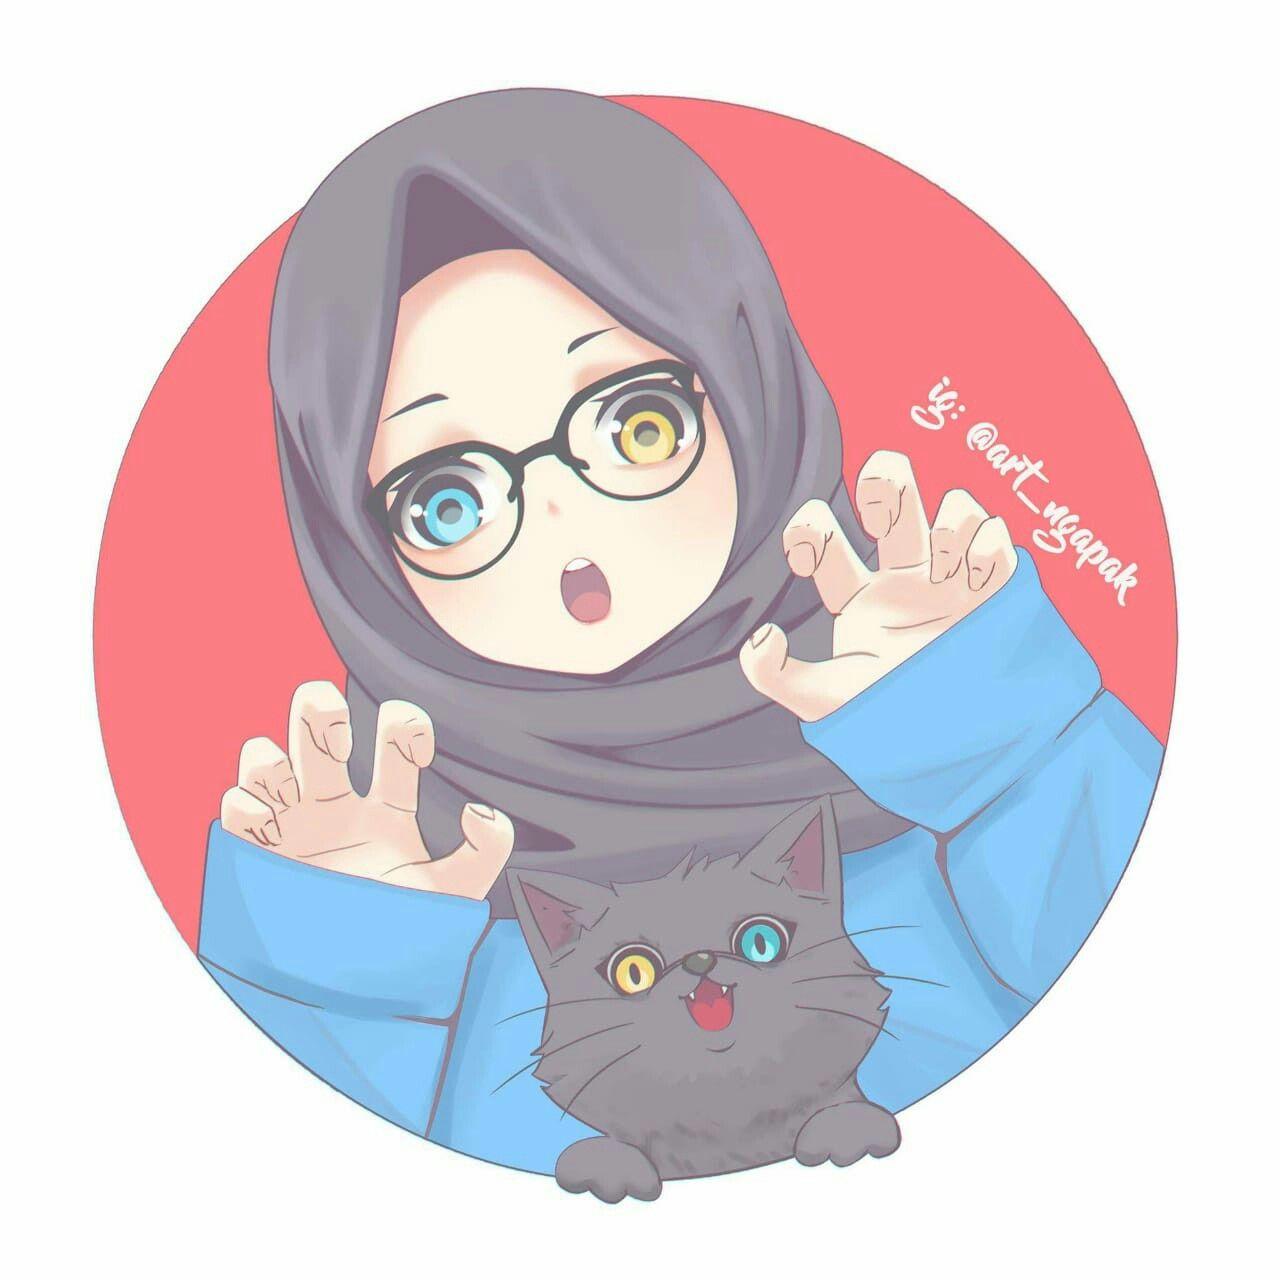 Pin Oleh Sarah Eldakak Di Muslim Anime